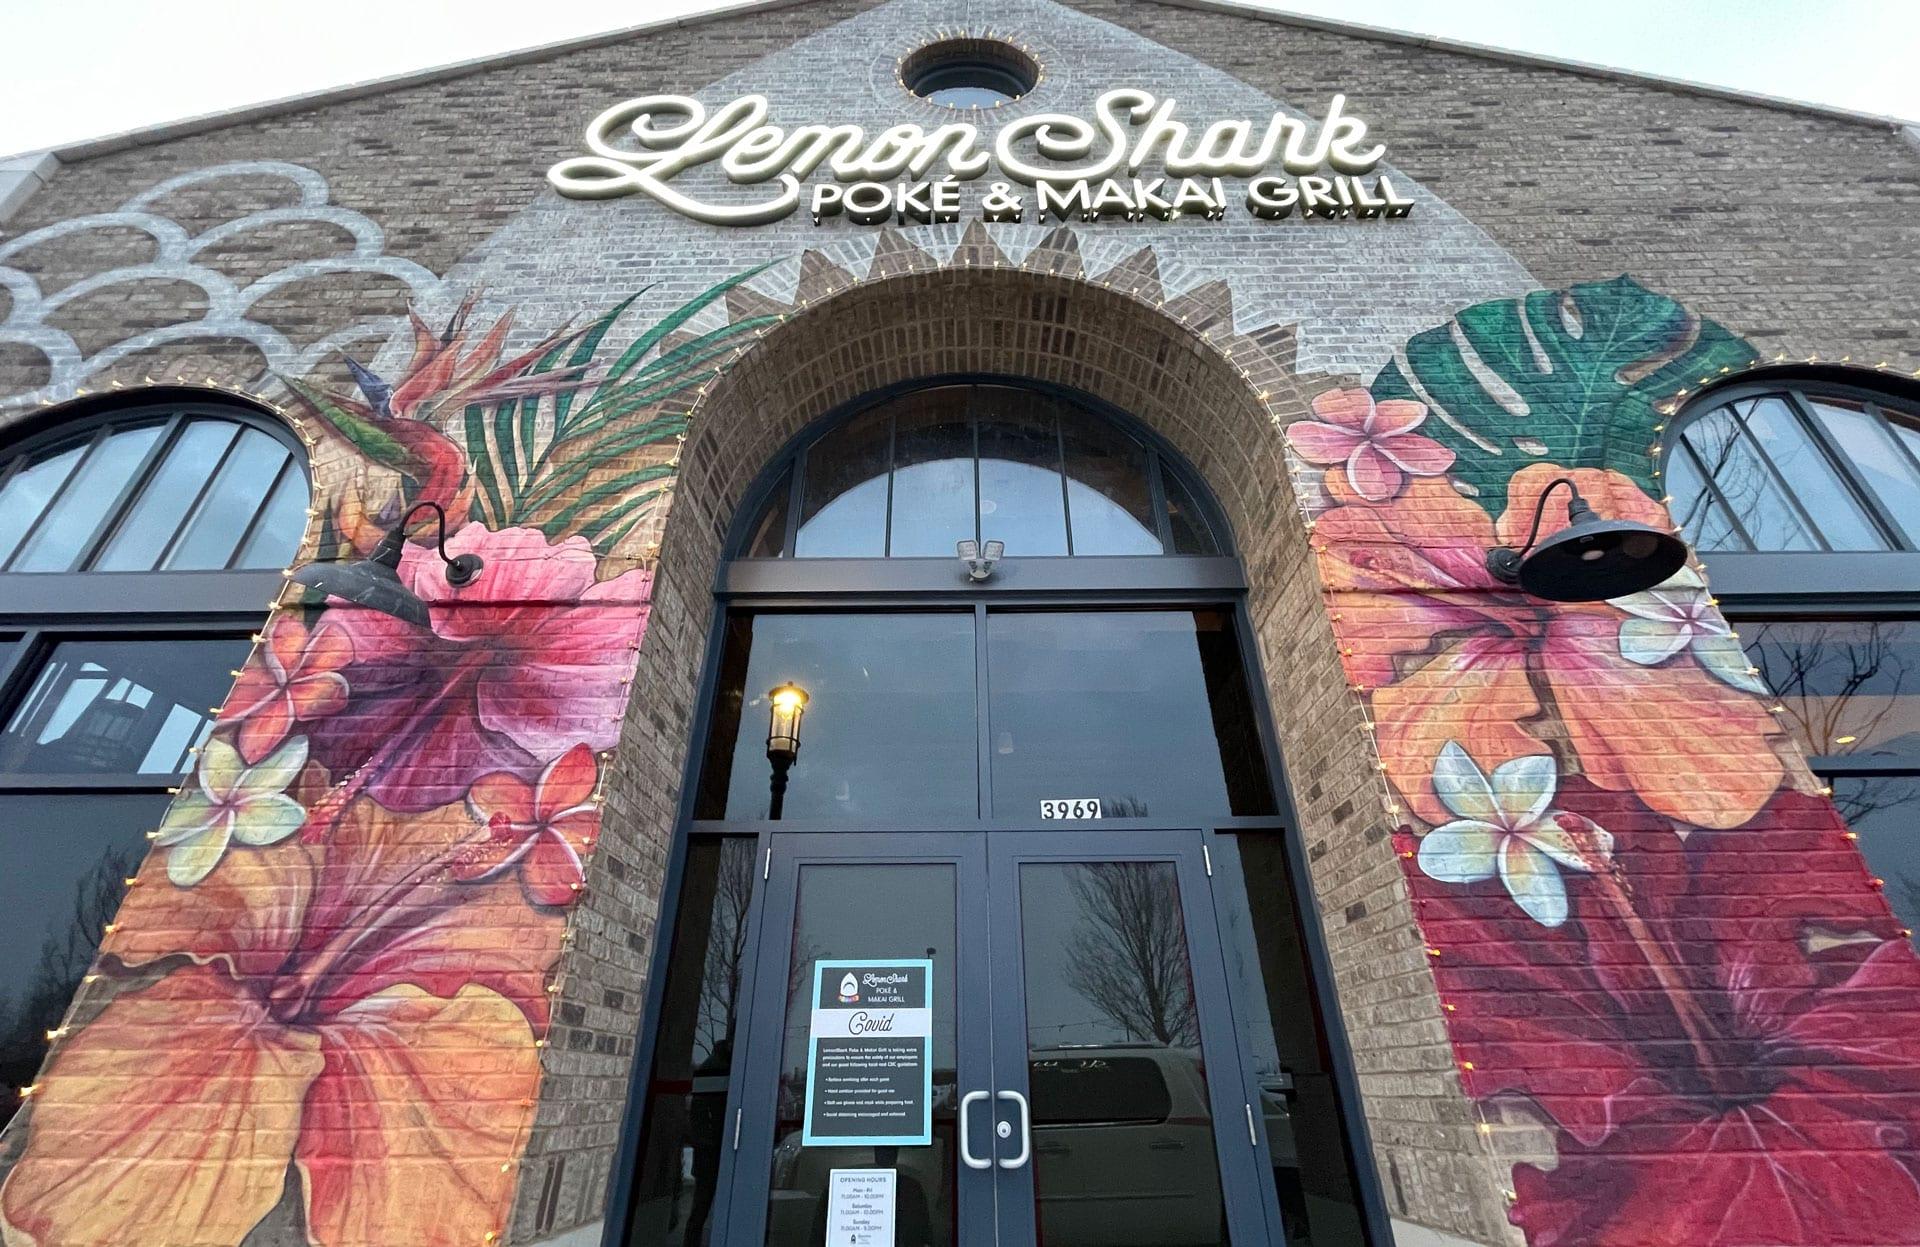 Lemonshark Poke Makai Grill Columbus Exterior